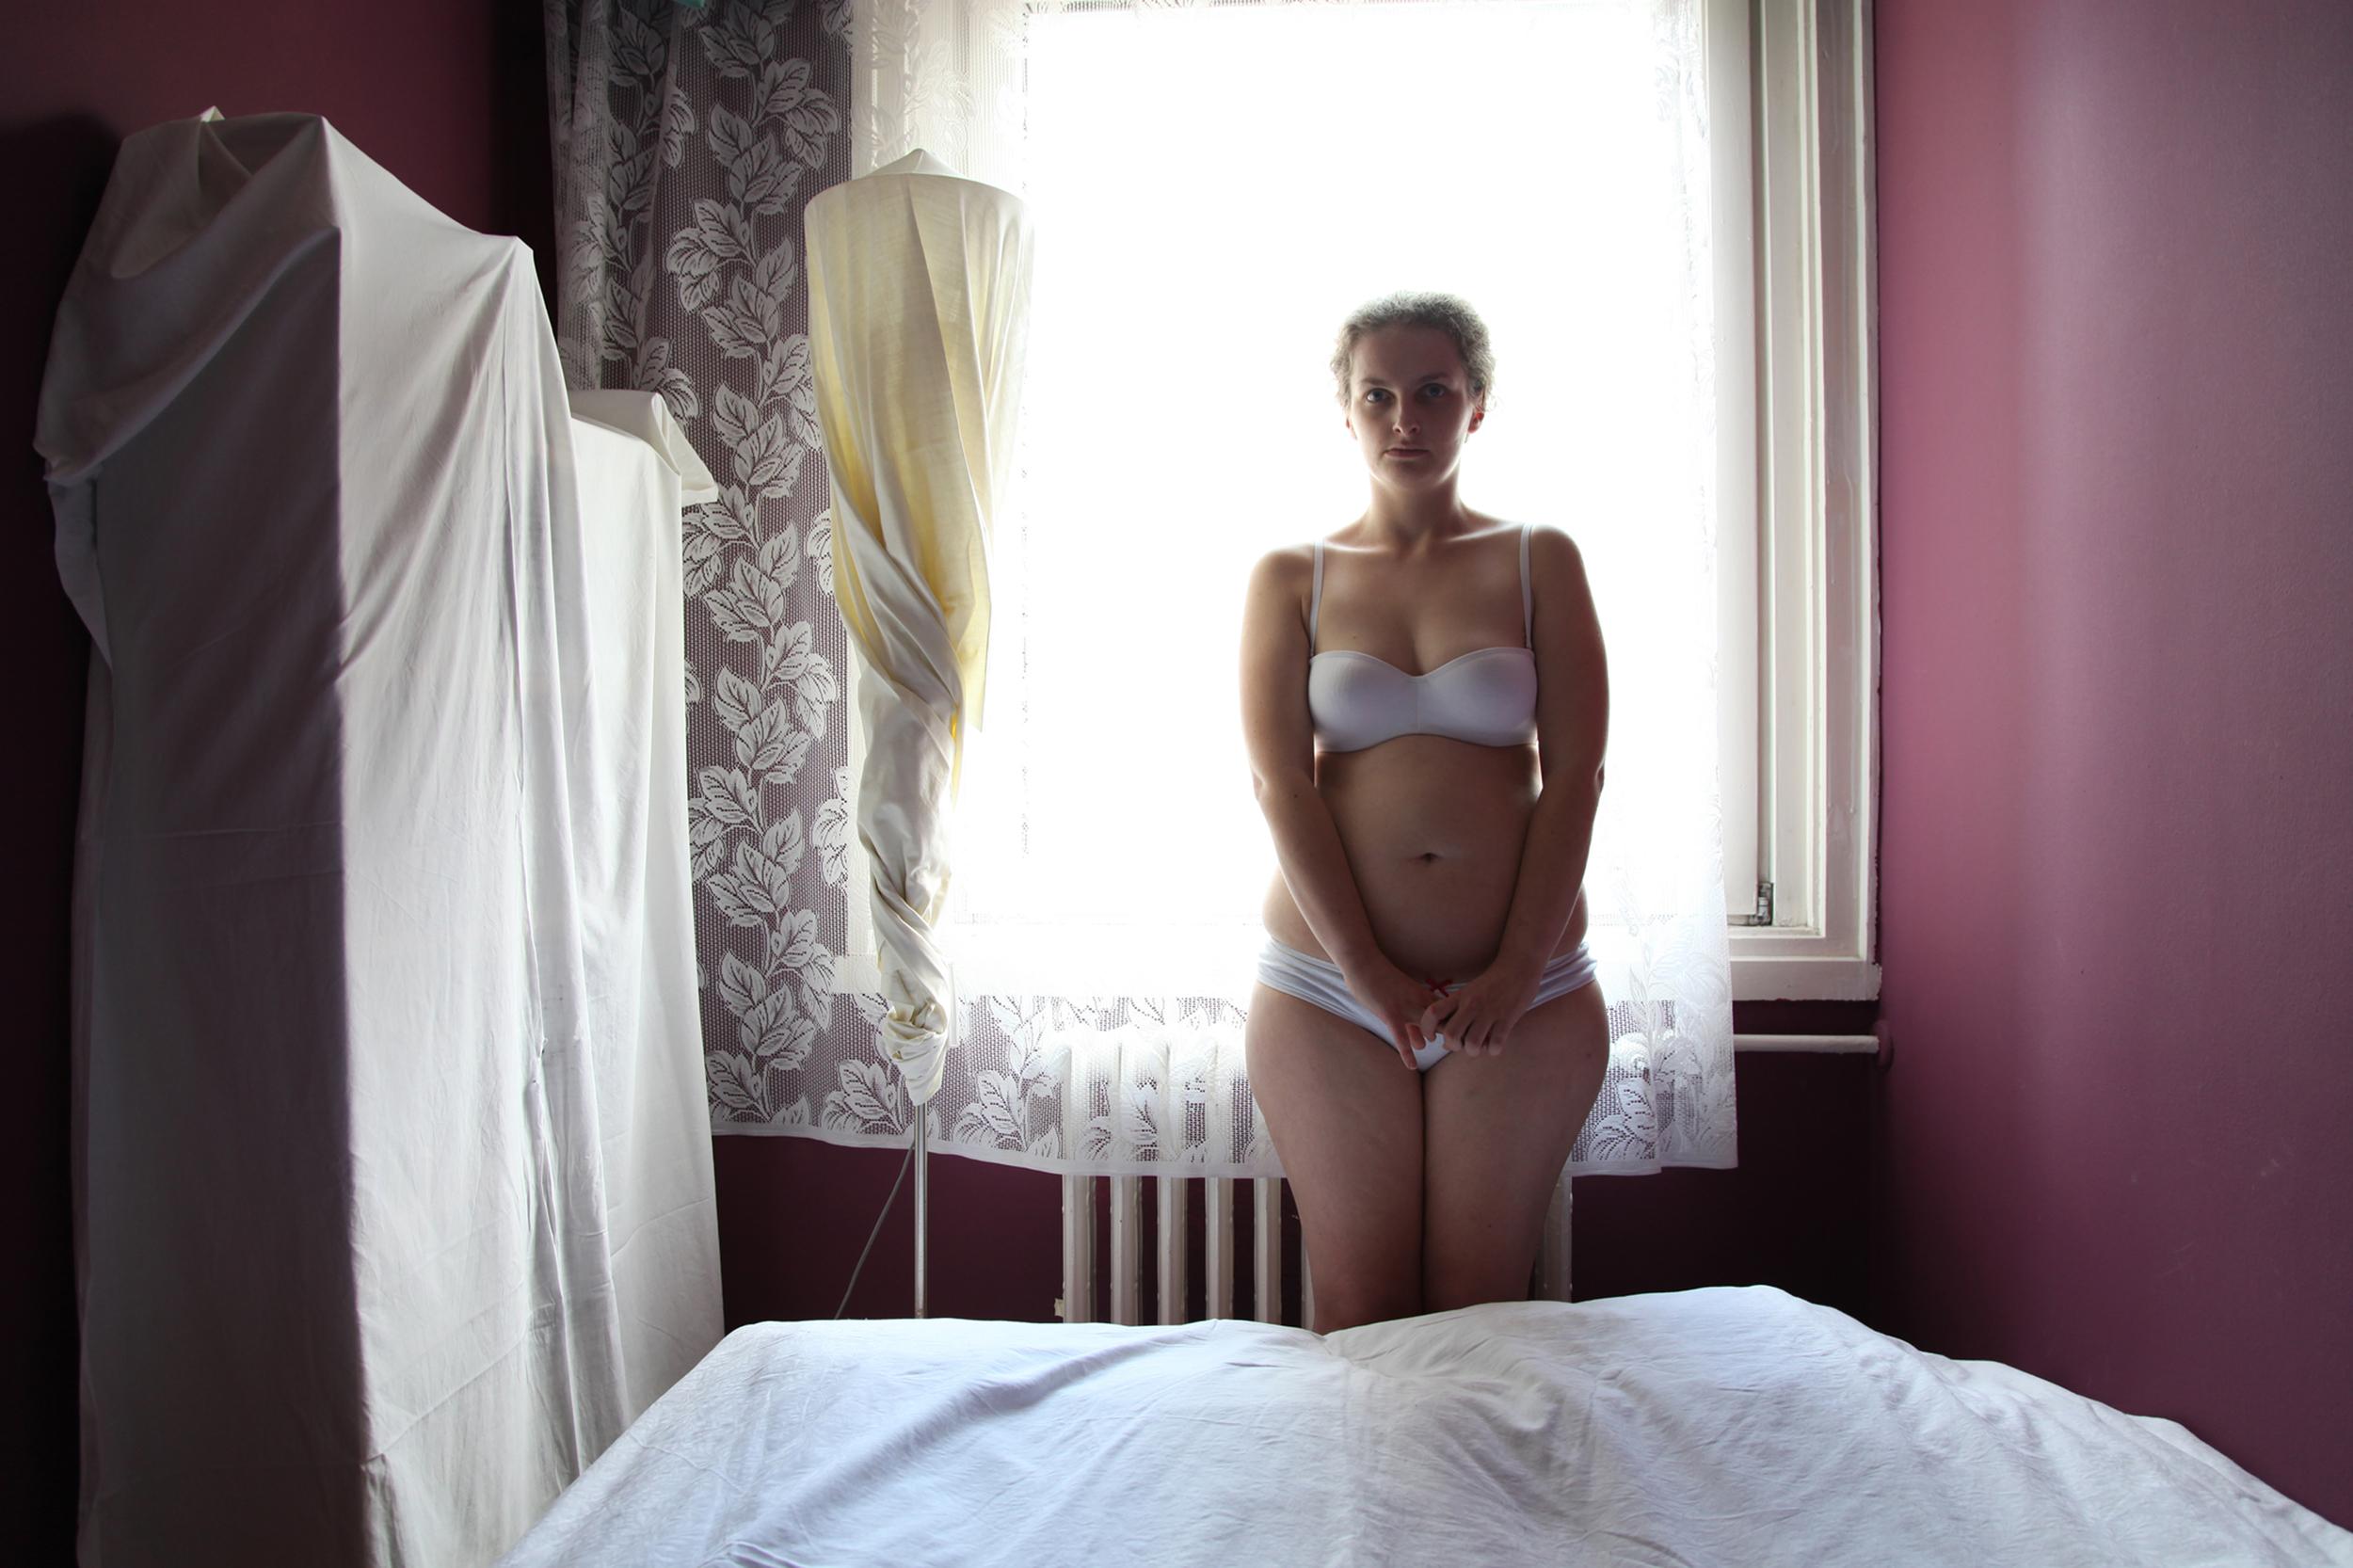 annagyurkovics-untitled-01